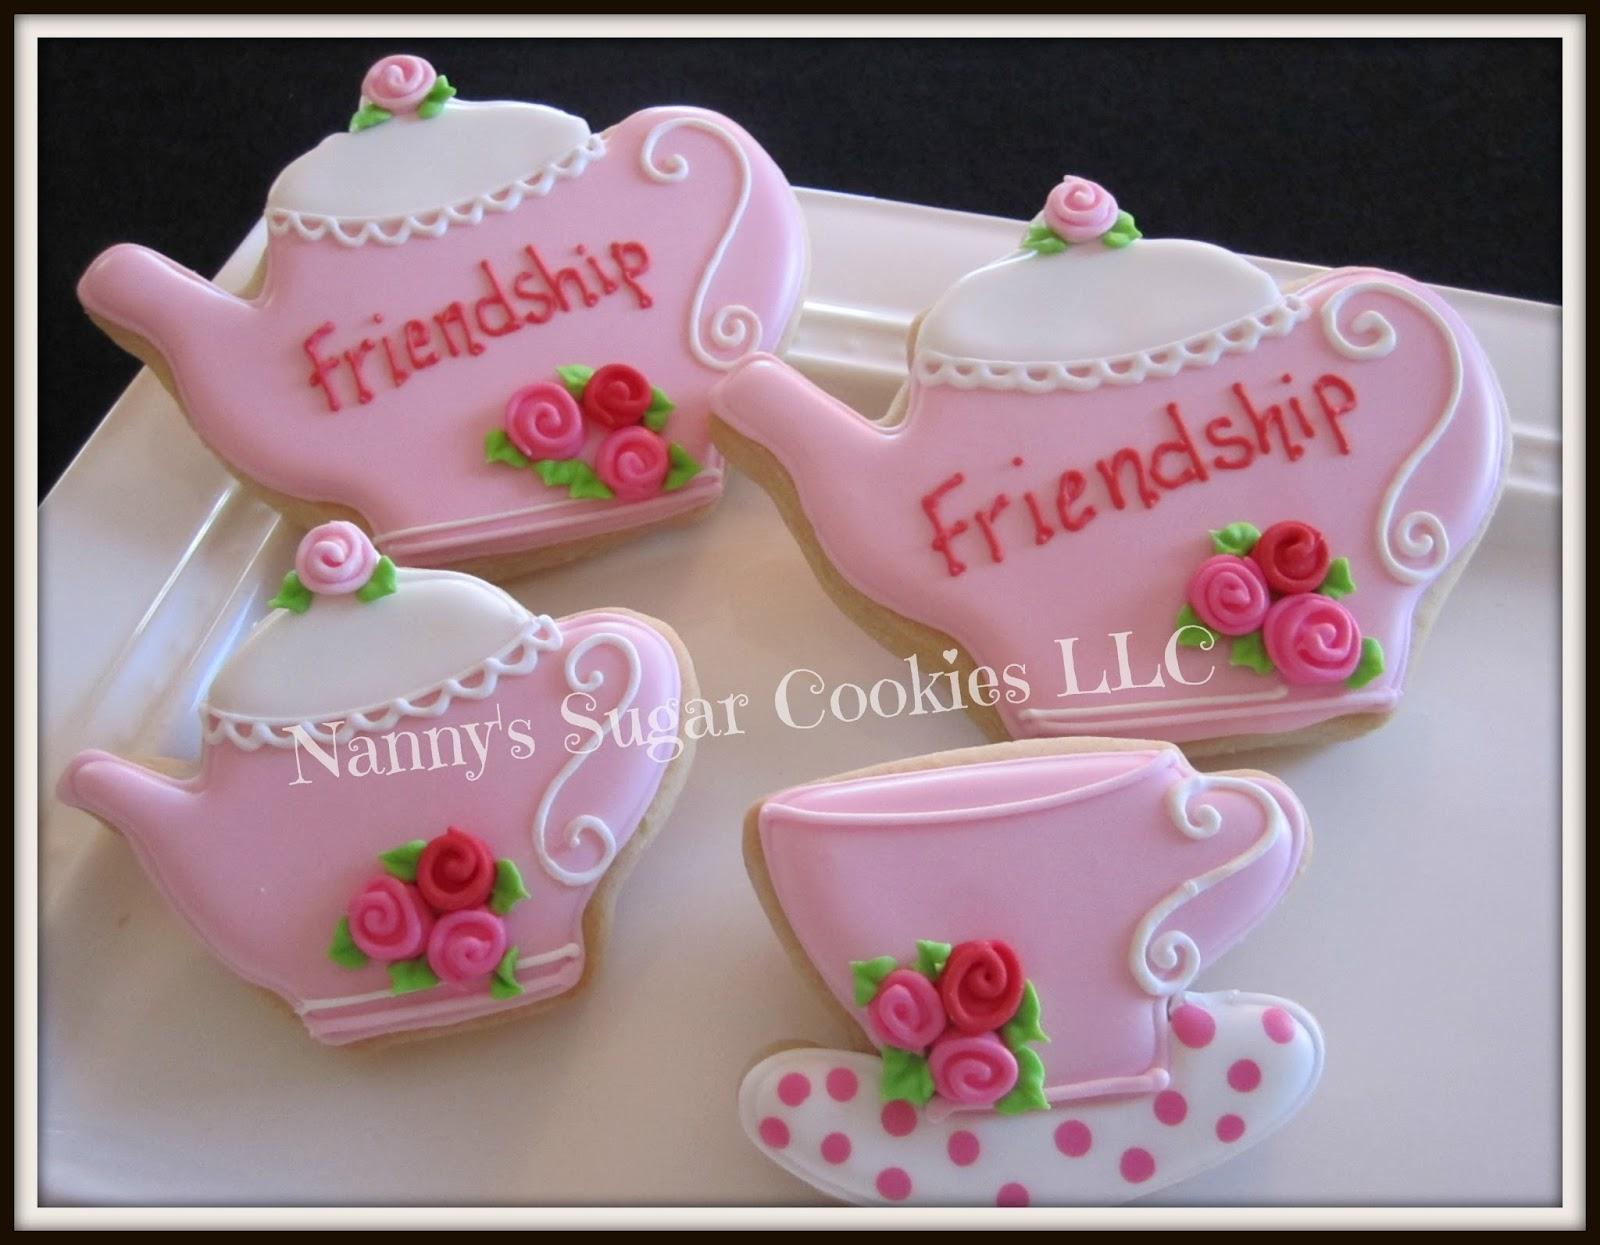 Nanny\'s Sugar Cookies LLC: Tea Time and Hats...